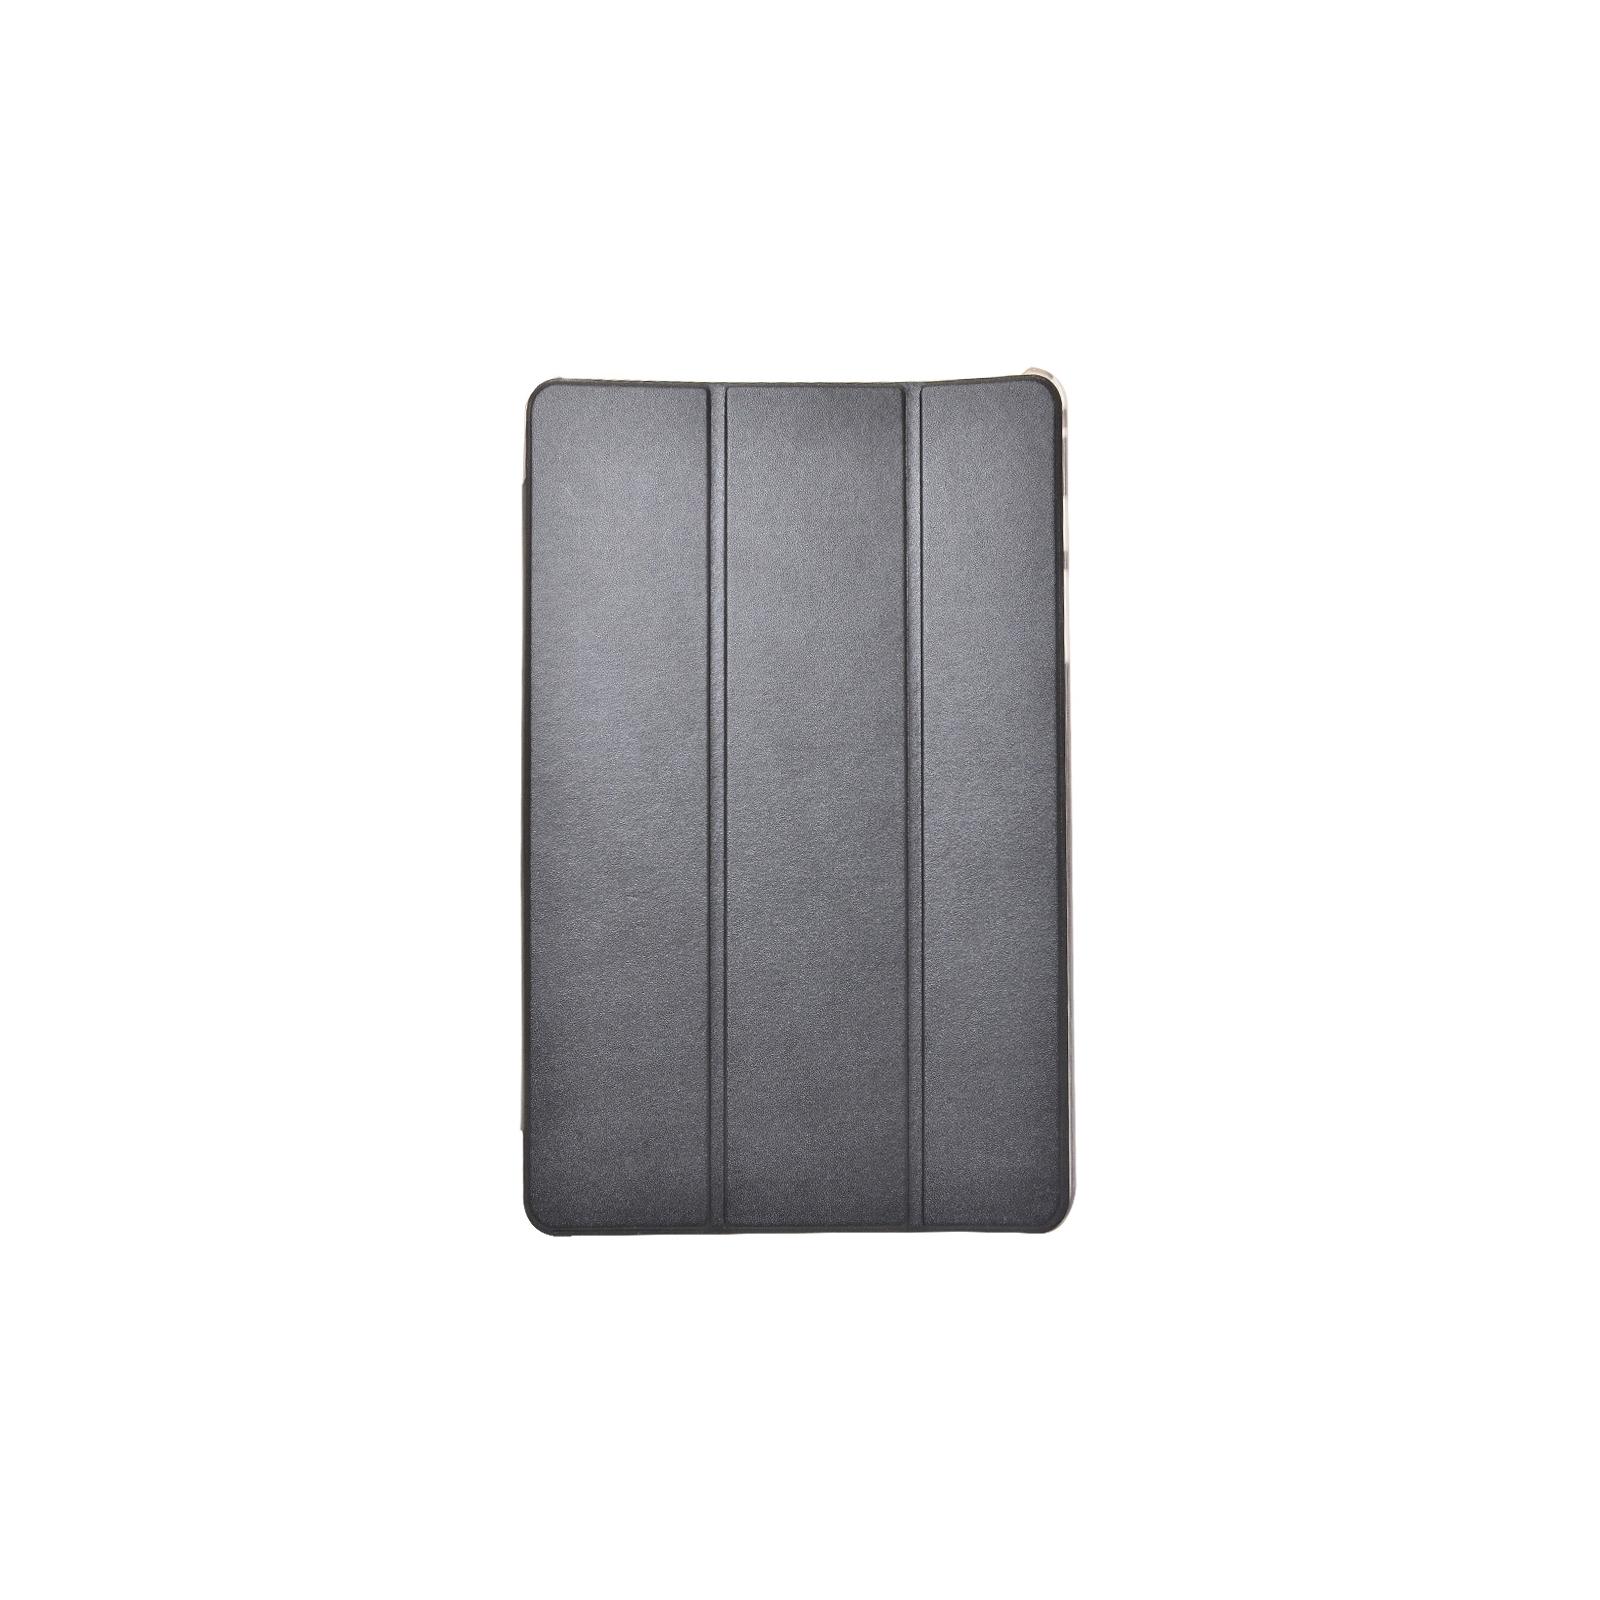 "Чехол для планшета Pro-case 9,7"" TFC Samsung T550/555(Tab A) Black (PCTFCT550Bl)"